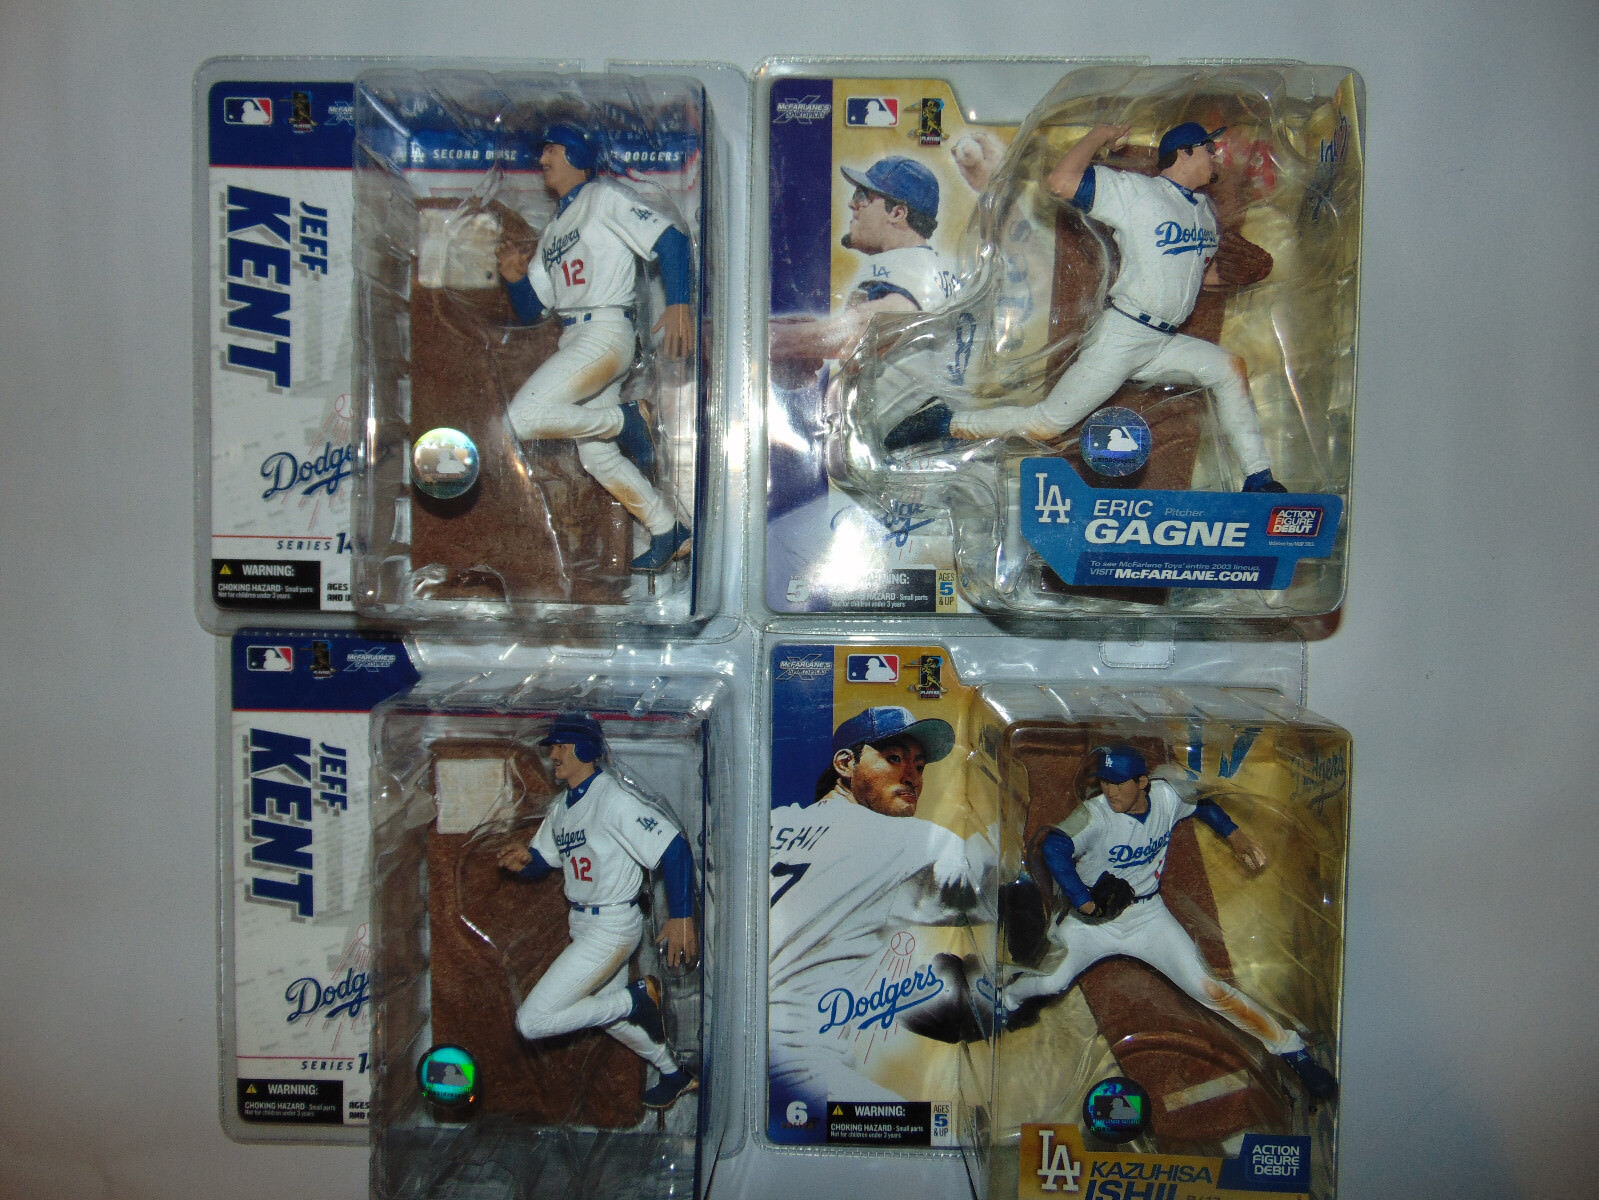 4) LOS ANGELES Dodgers ALL Weiß JERSEY Jeff Kent/ISHII/GAGNE Lot Set Mcfarlane